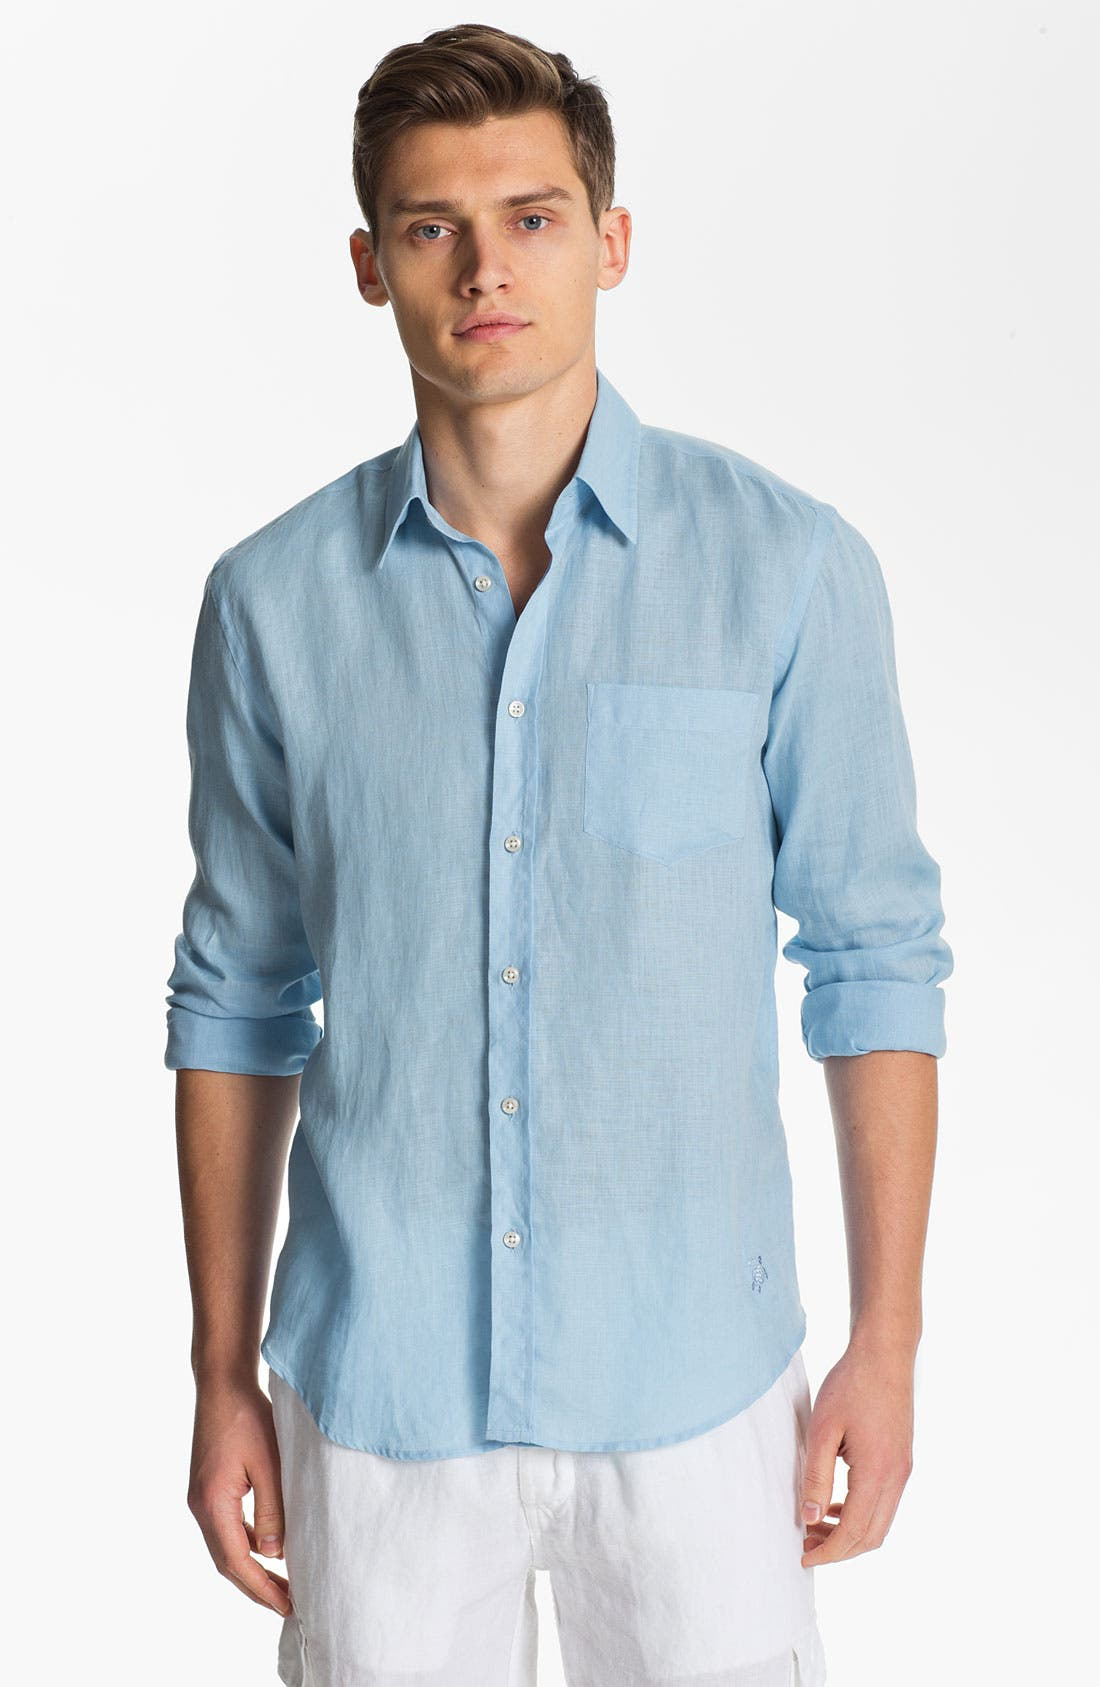 Alternate Image 1 Selected - Vilebrequin 'Caroubier' Linen Sport Shirt